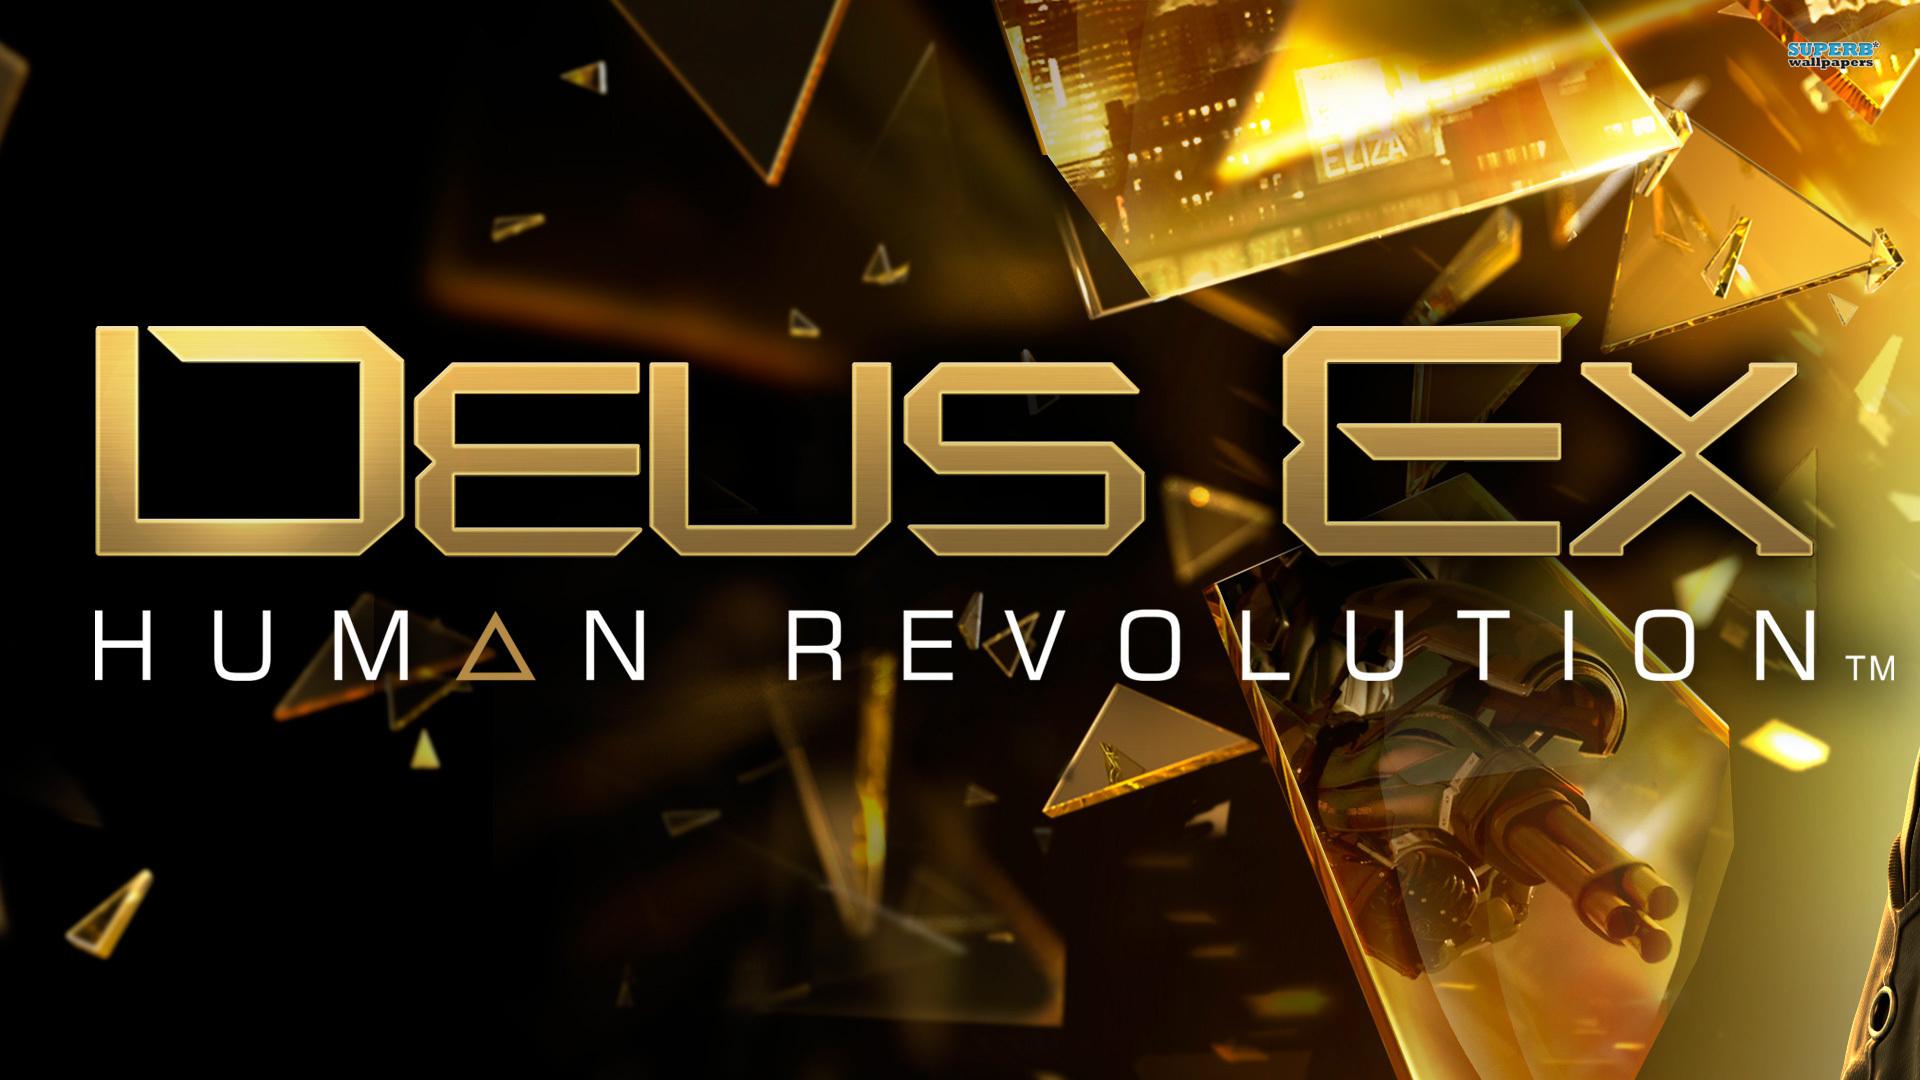 deus ex human revolution animated wallpaper